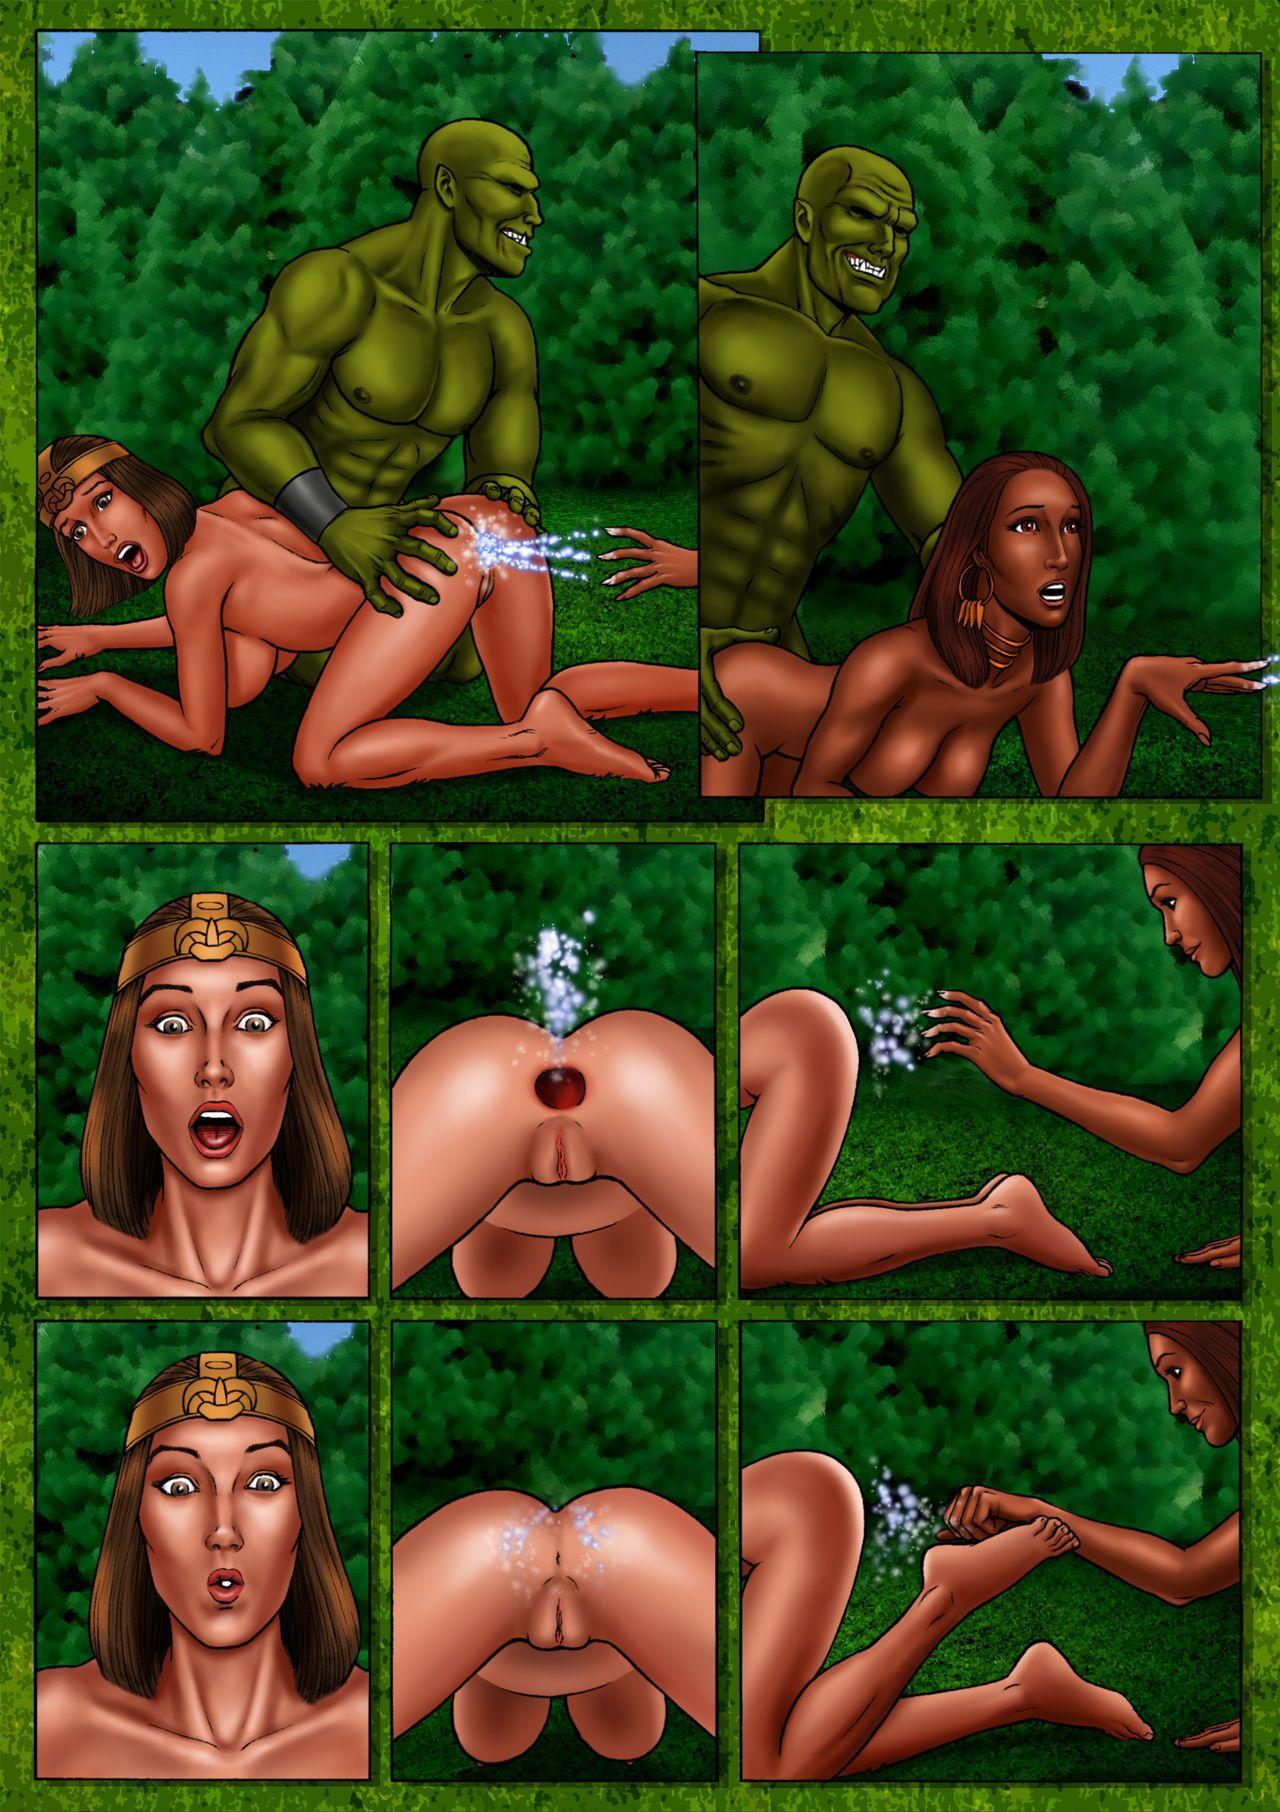 Ben 10: Alien Force fuckers - Dungeons and Dragons porn